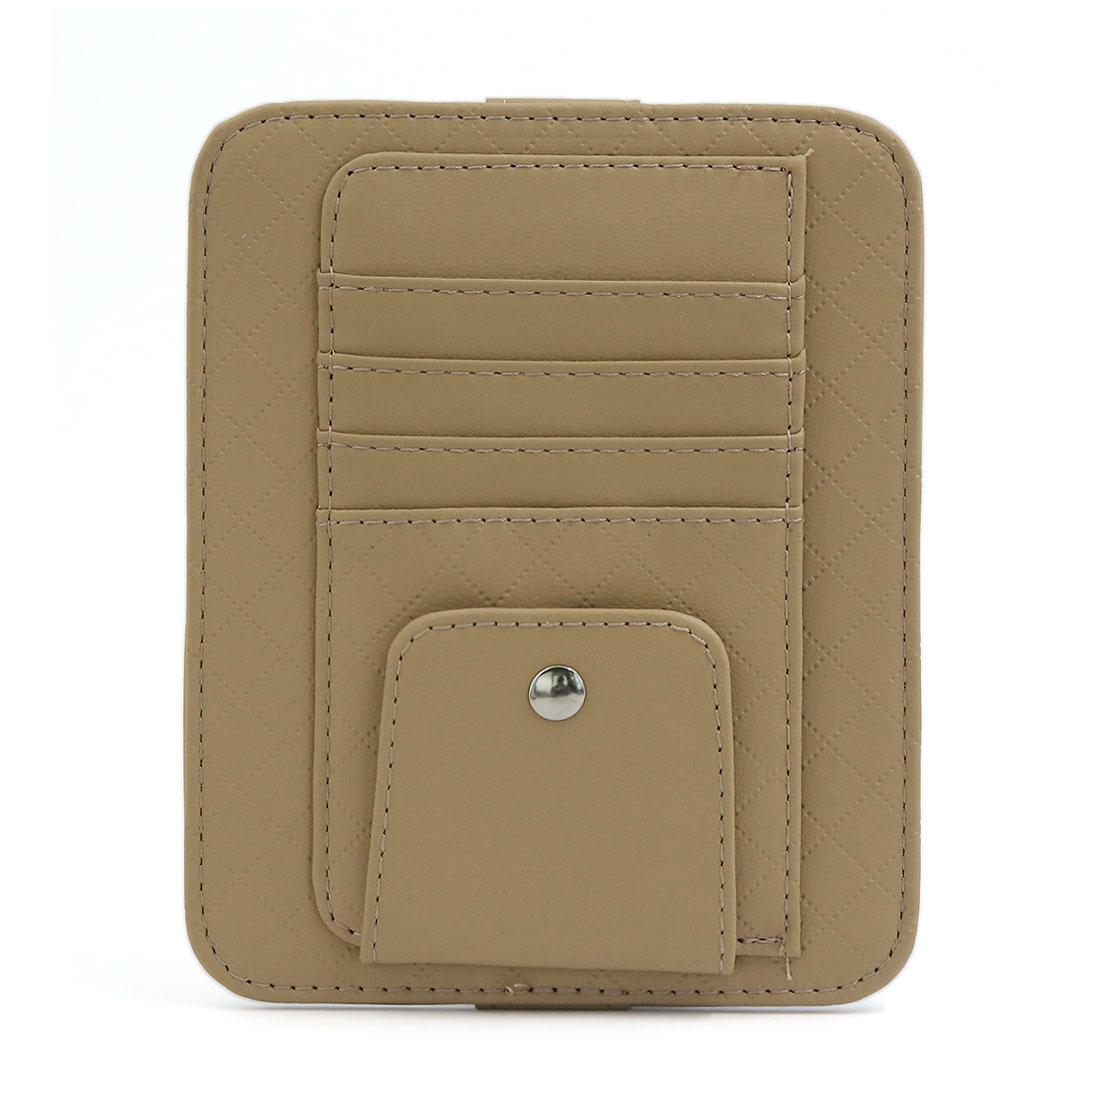 5 Slots Car Sun Visor CD DVD Business Card Storage Pocket Holder Organizer Beige